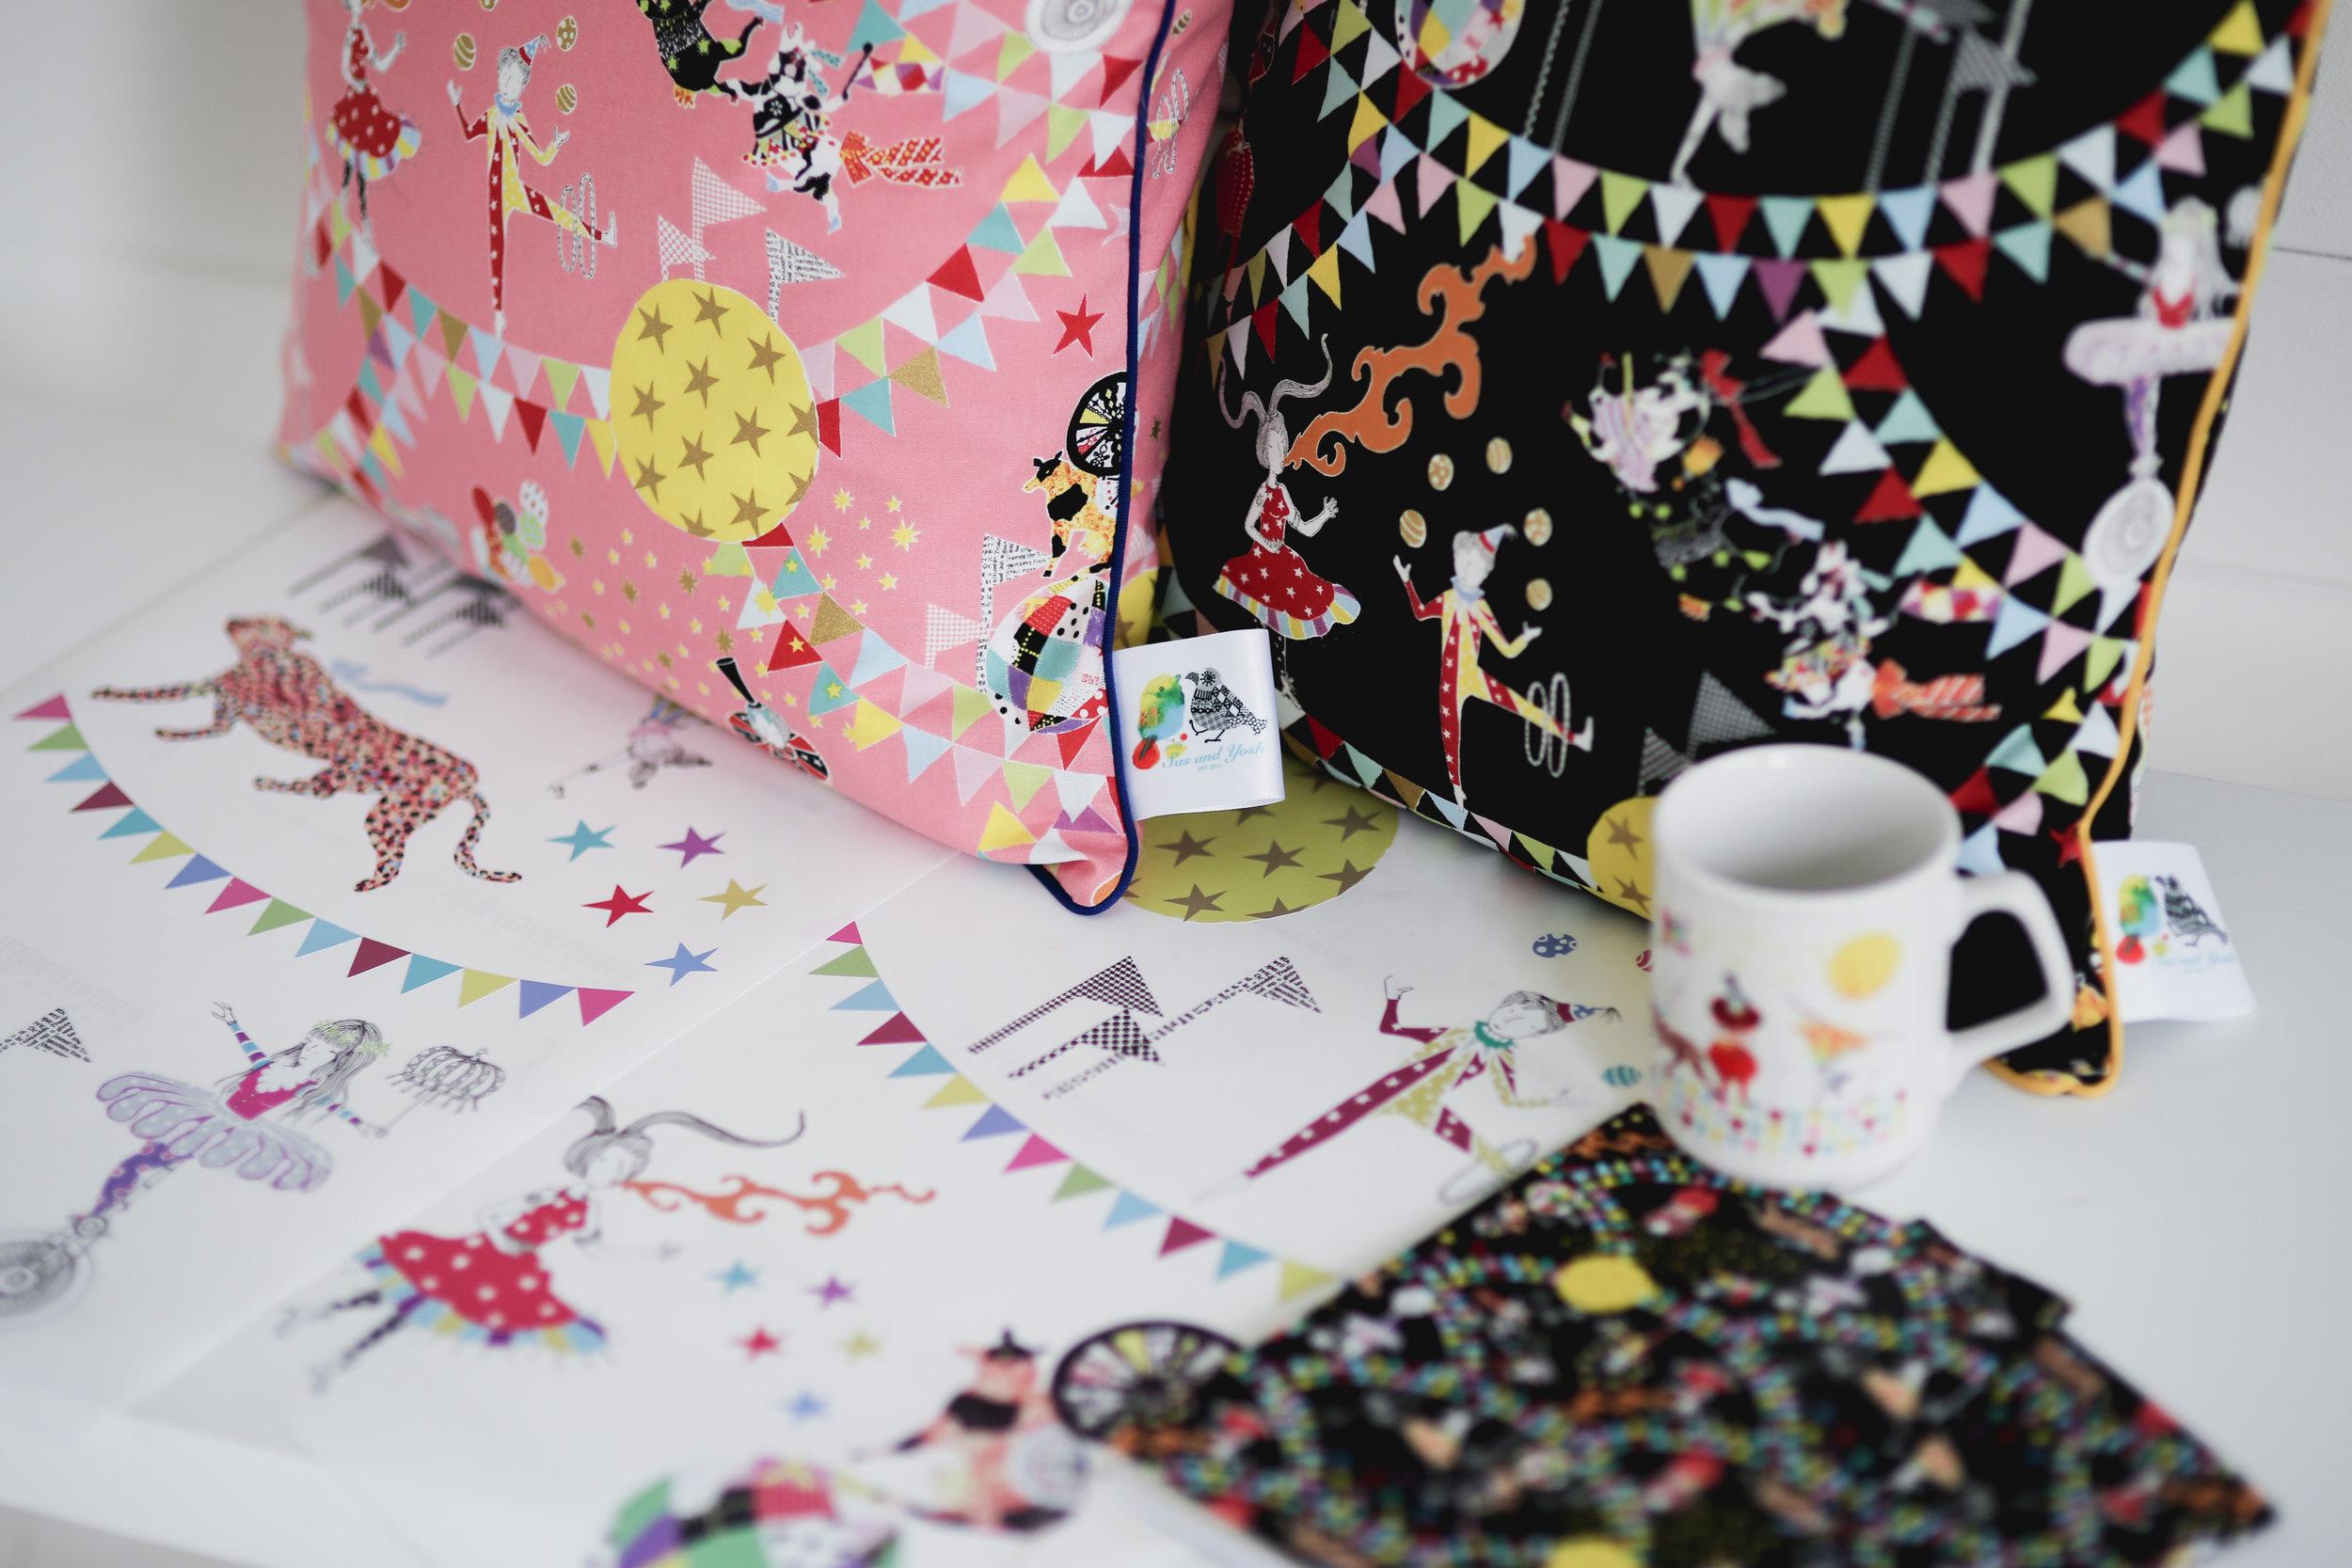 Sas and Yosh cushions mugs and wallpapers